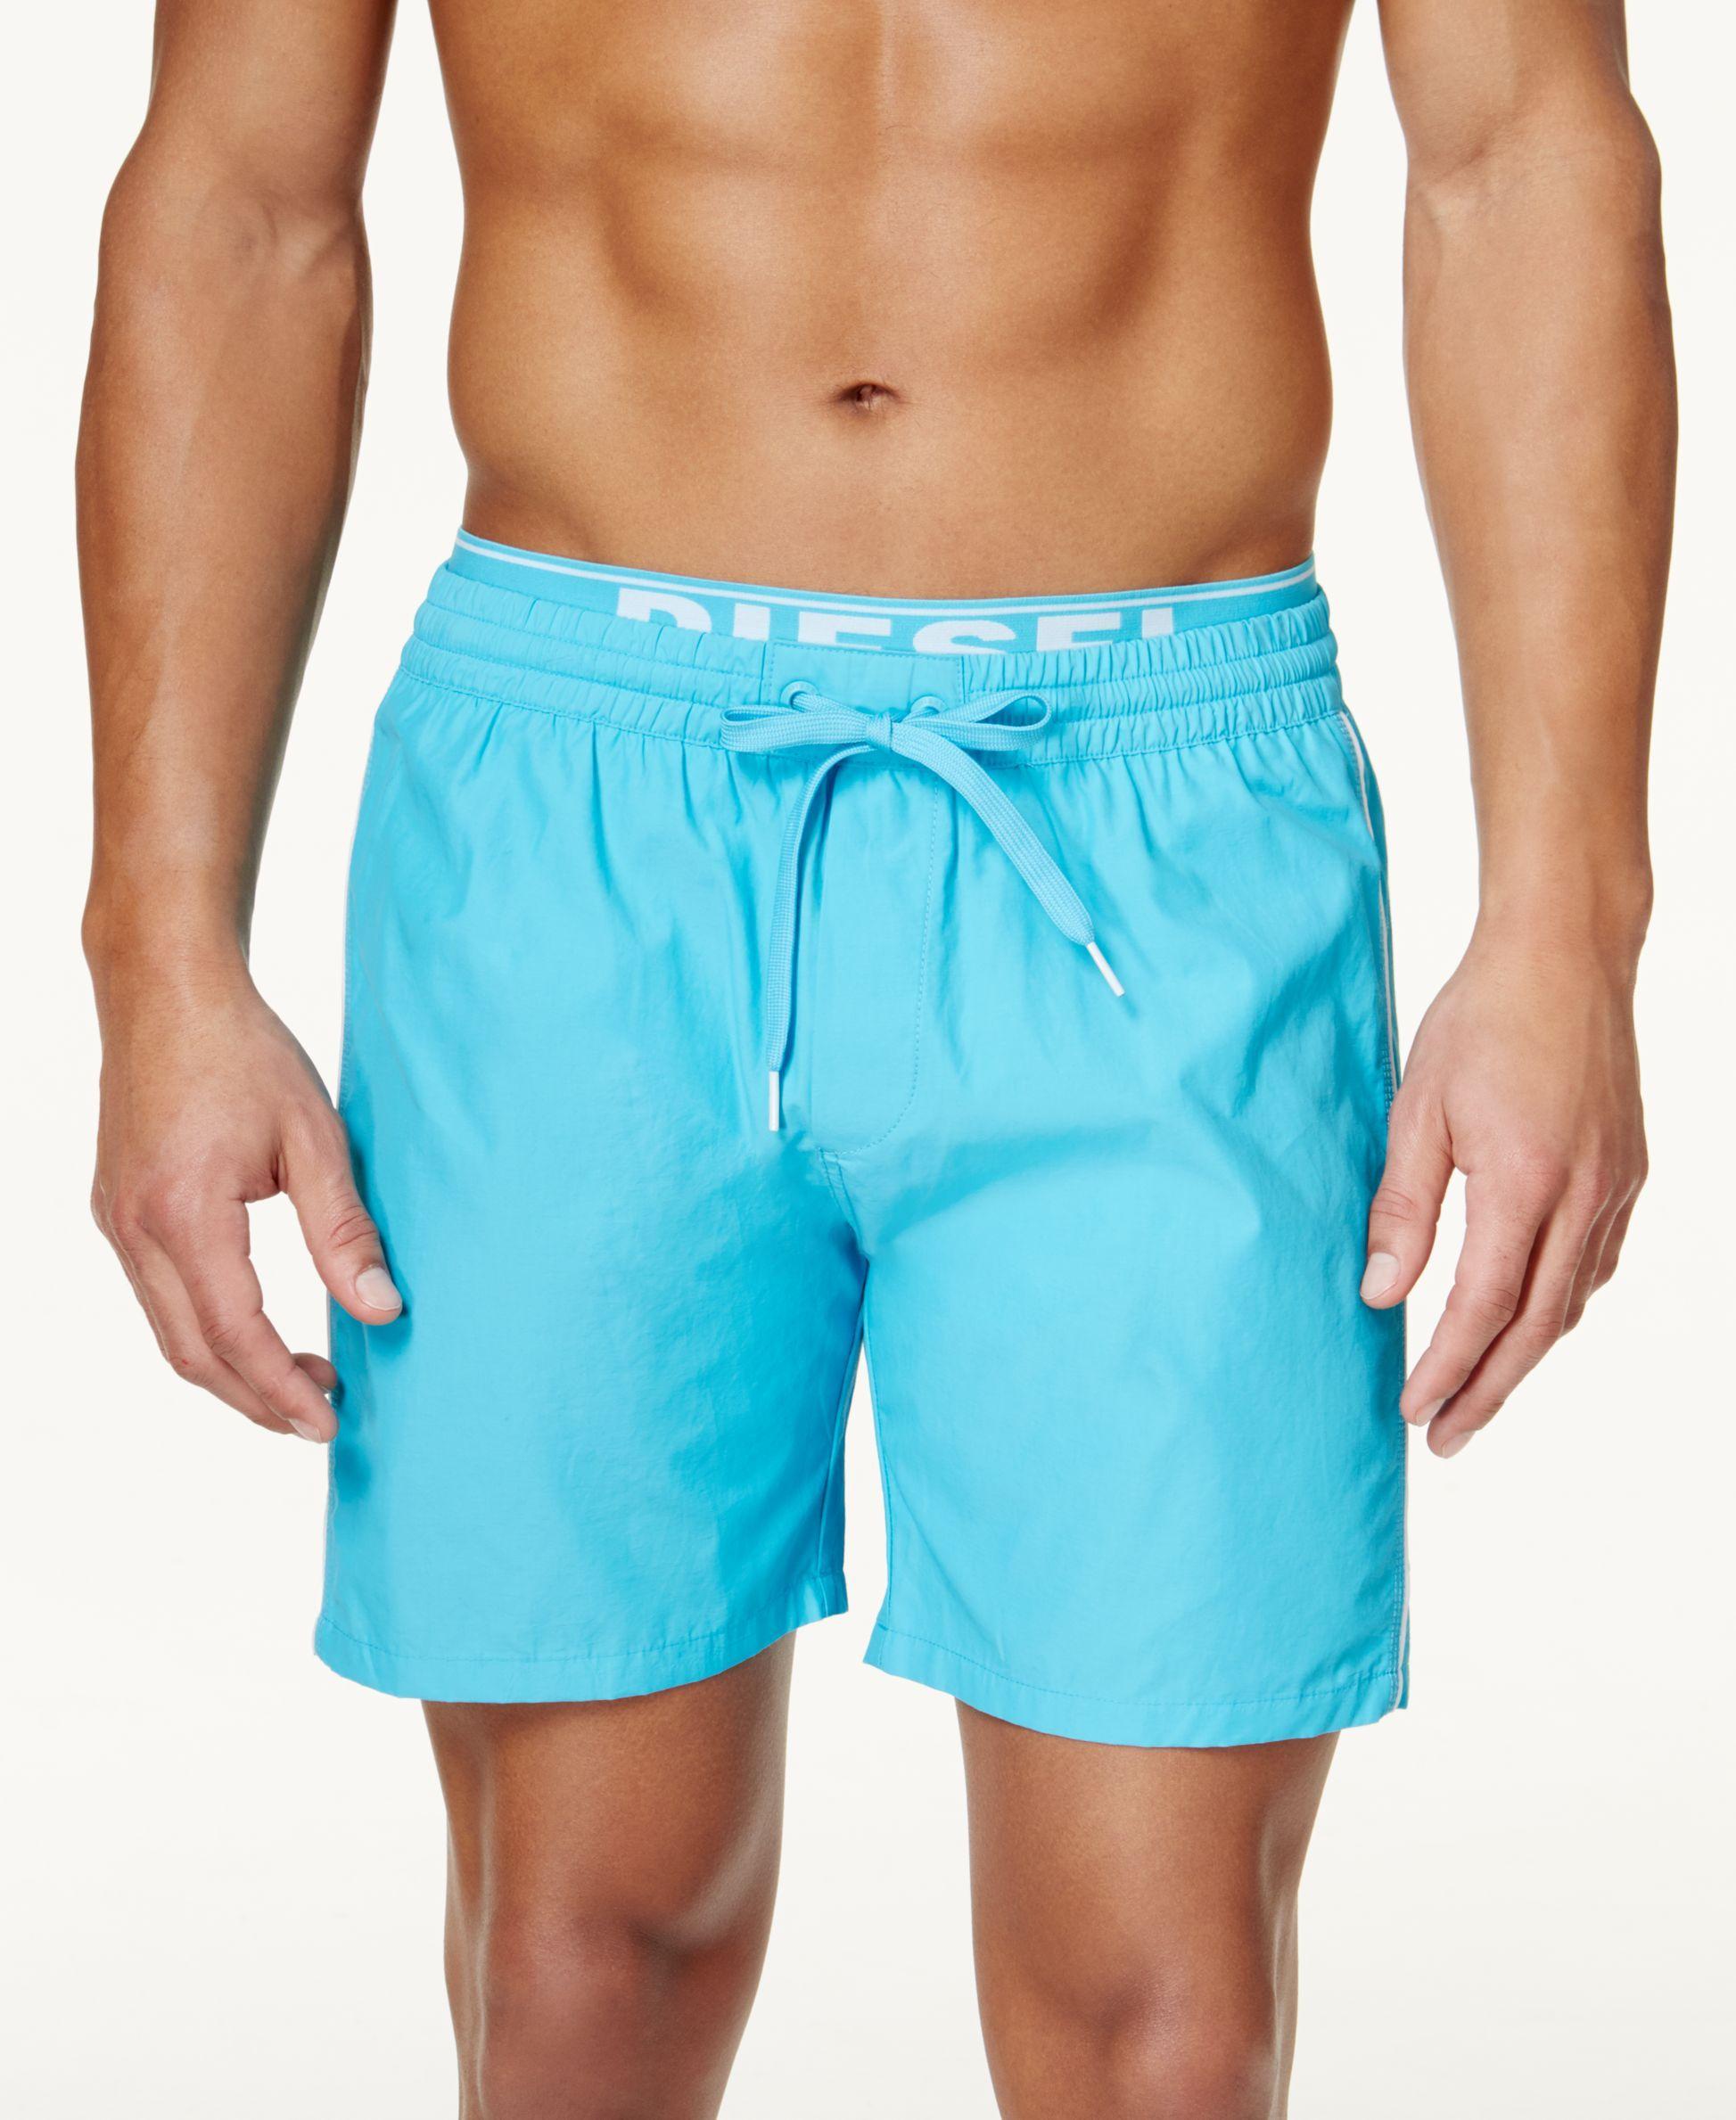 d20bb734405 Diesel Men's Bmbx Dolphin-e Solid Swim Shorts | men's swimwear ...